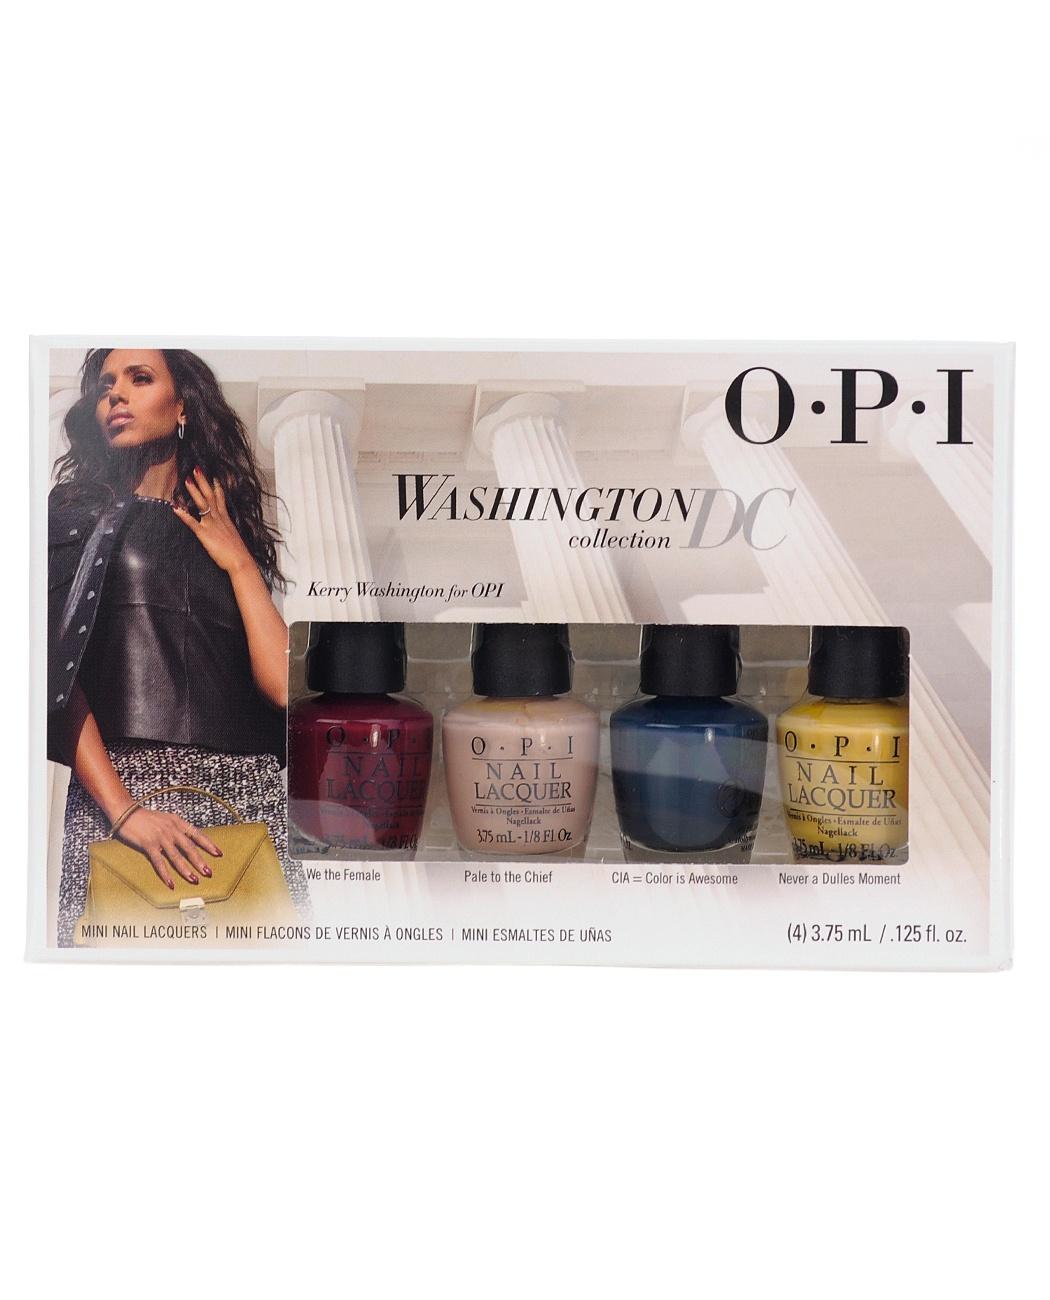 Opi Mini Sets Beauty: Buy Online from Fishpond.co.nz